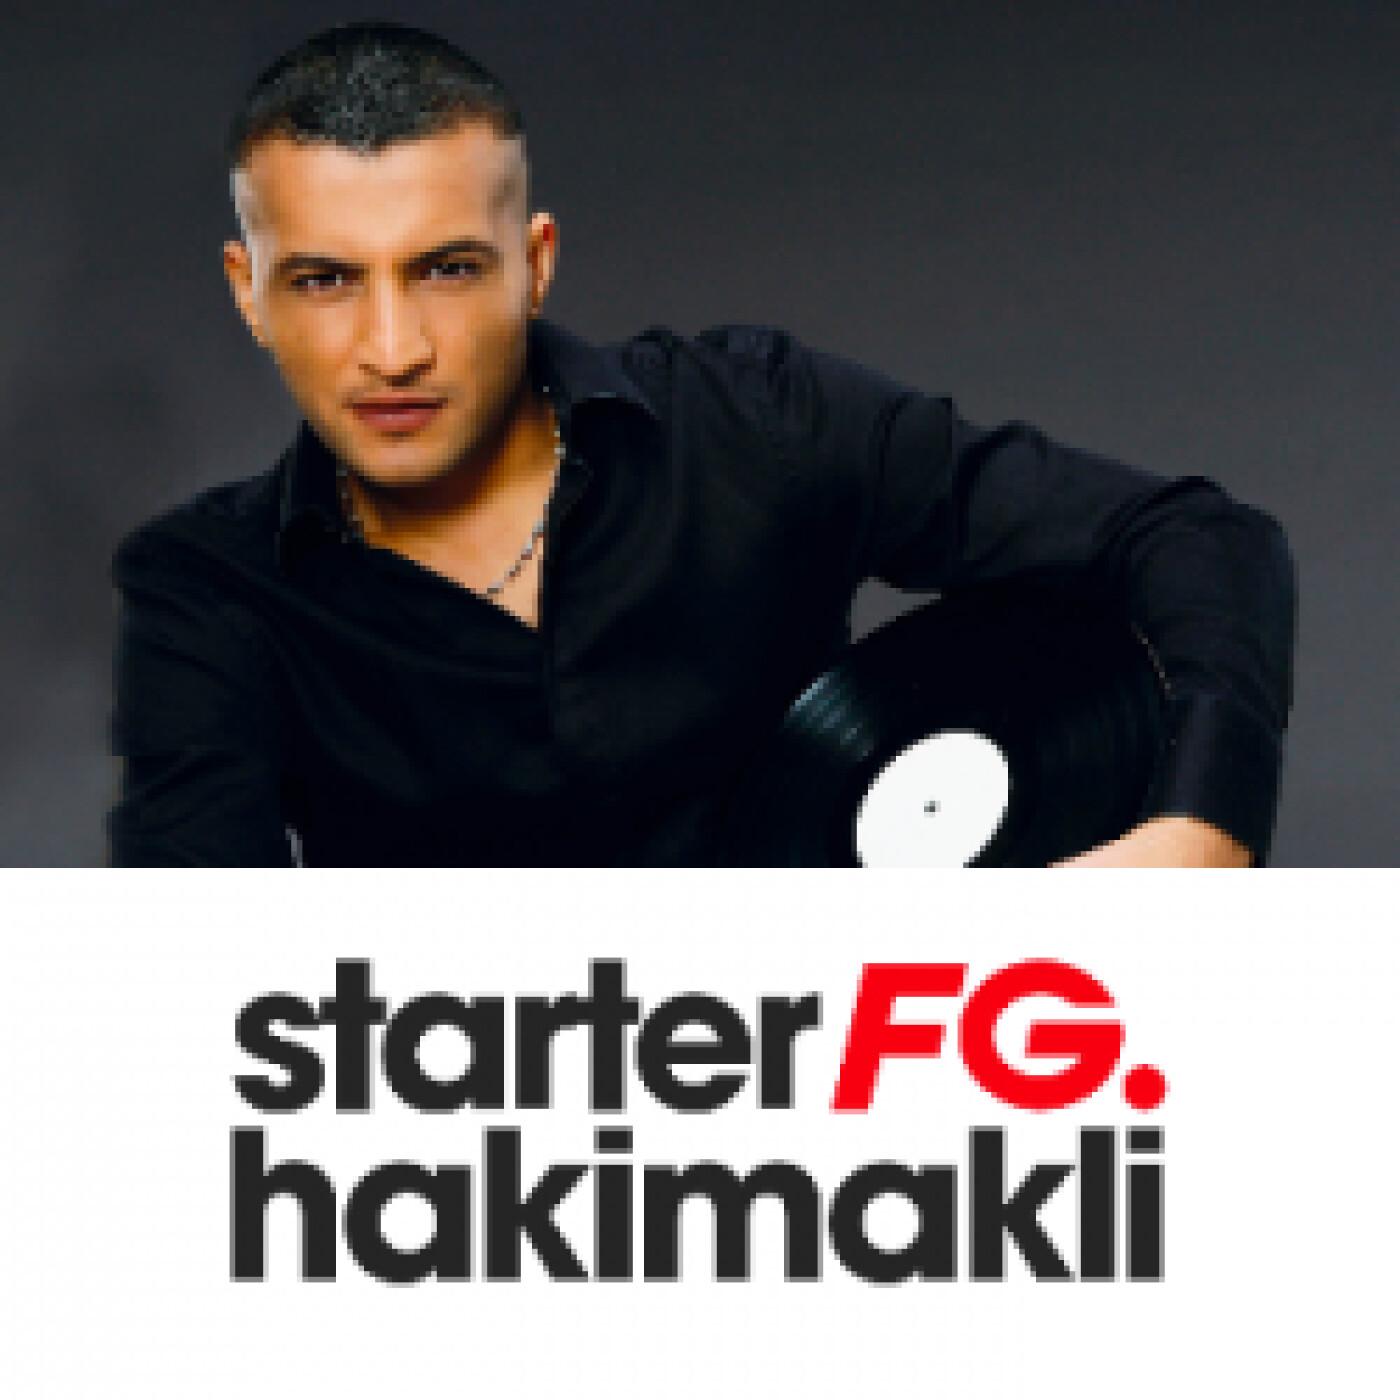 STARTER FG BY HAKIMAKLI MERCREDI 10 FEVRIER 2021